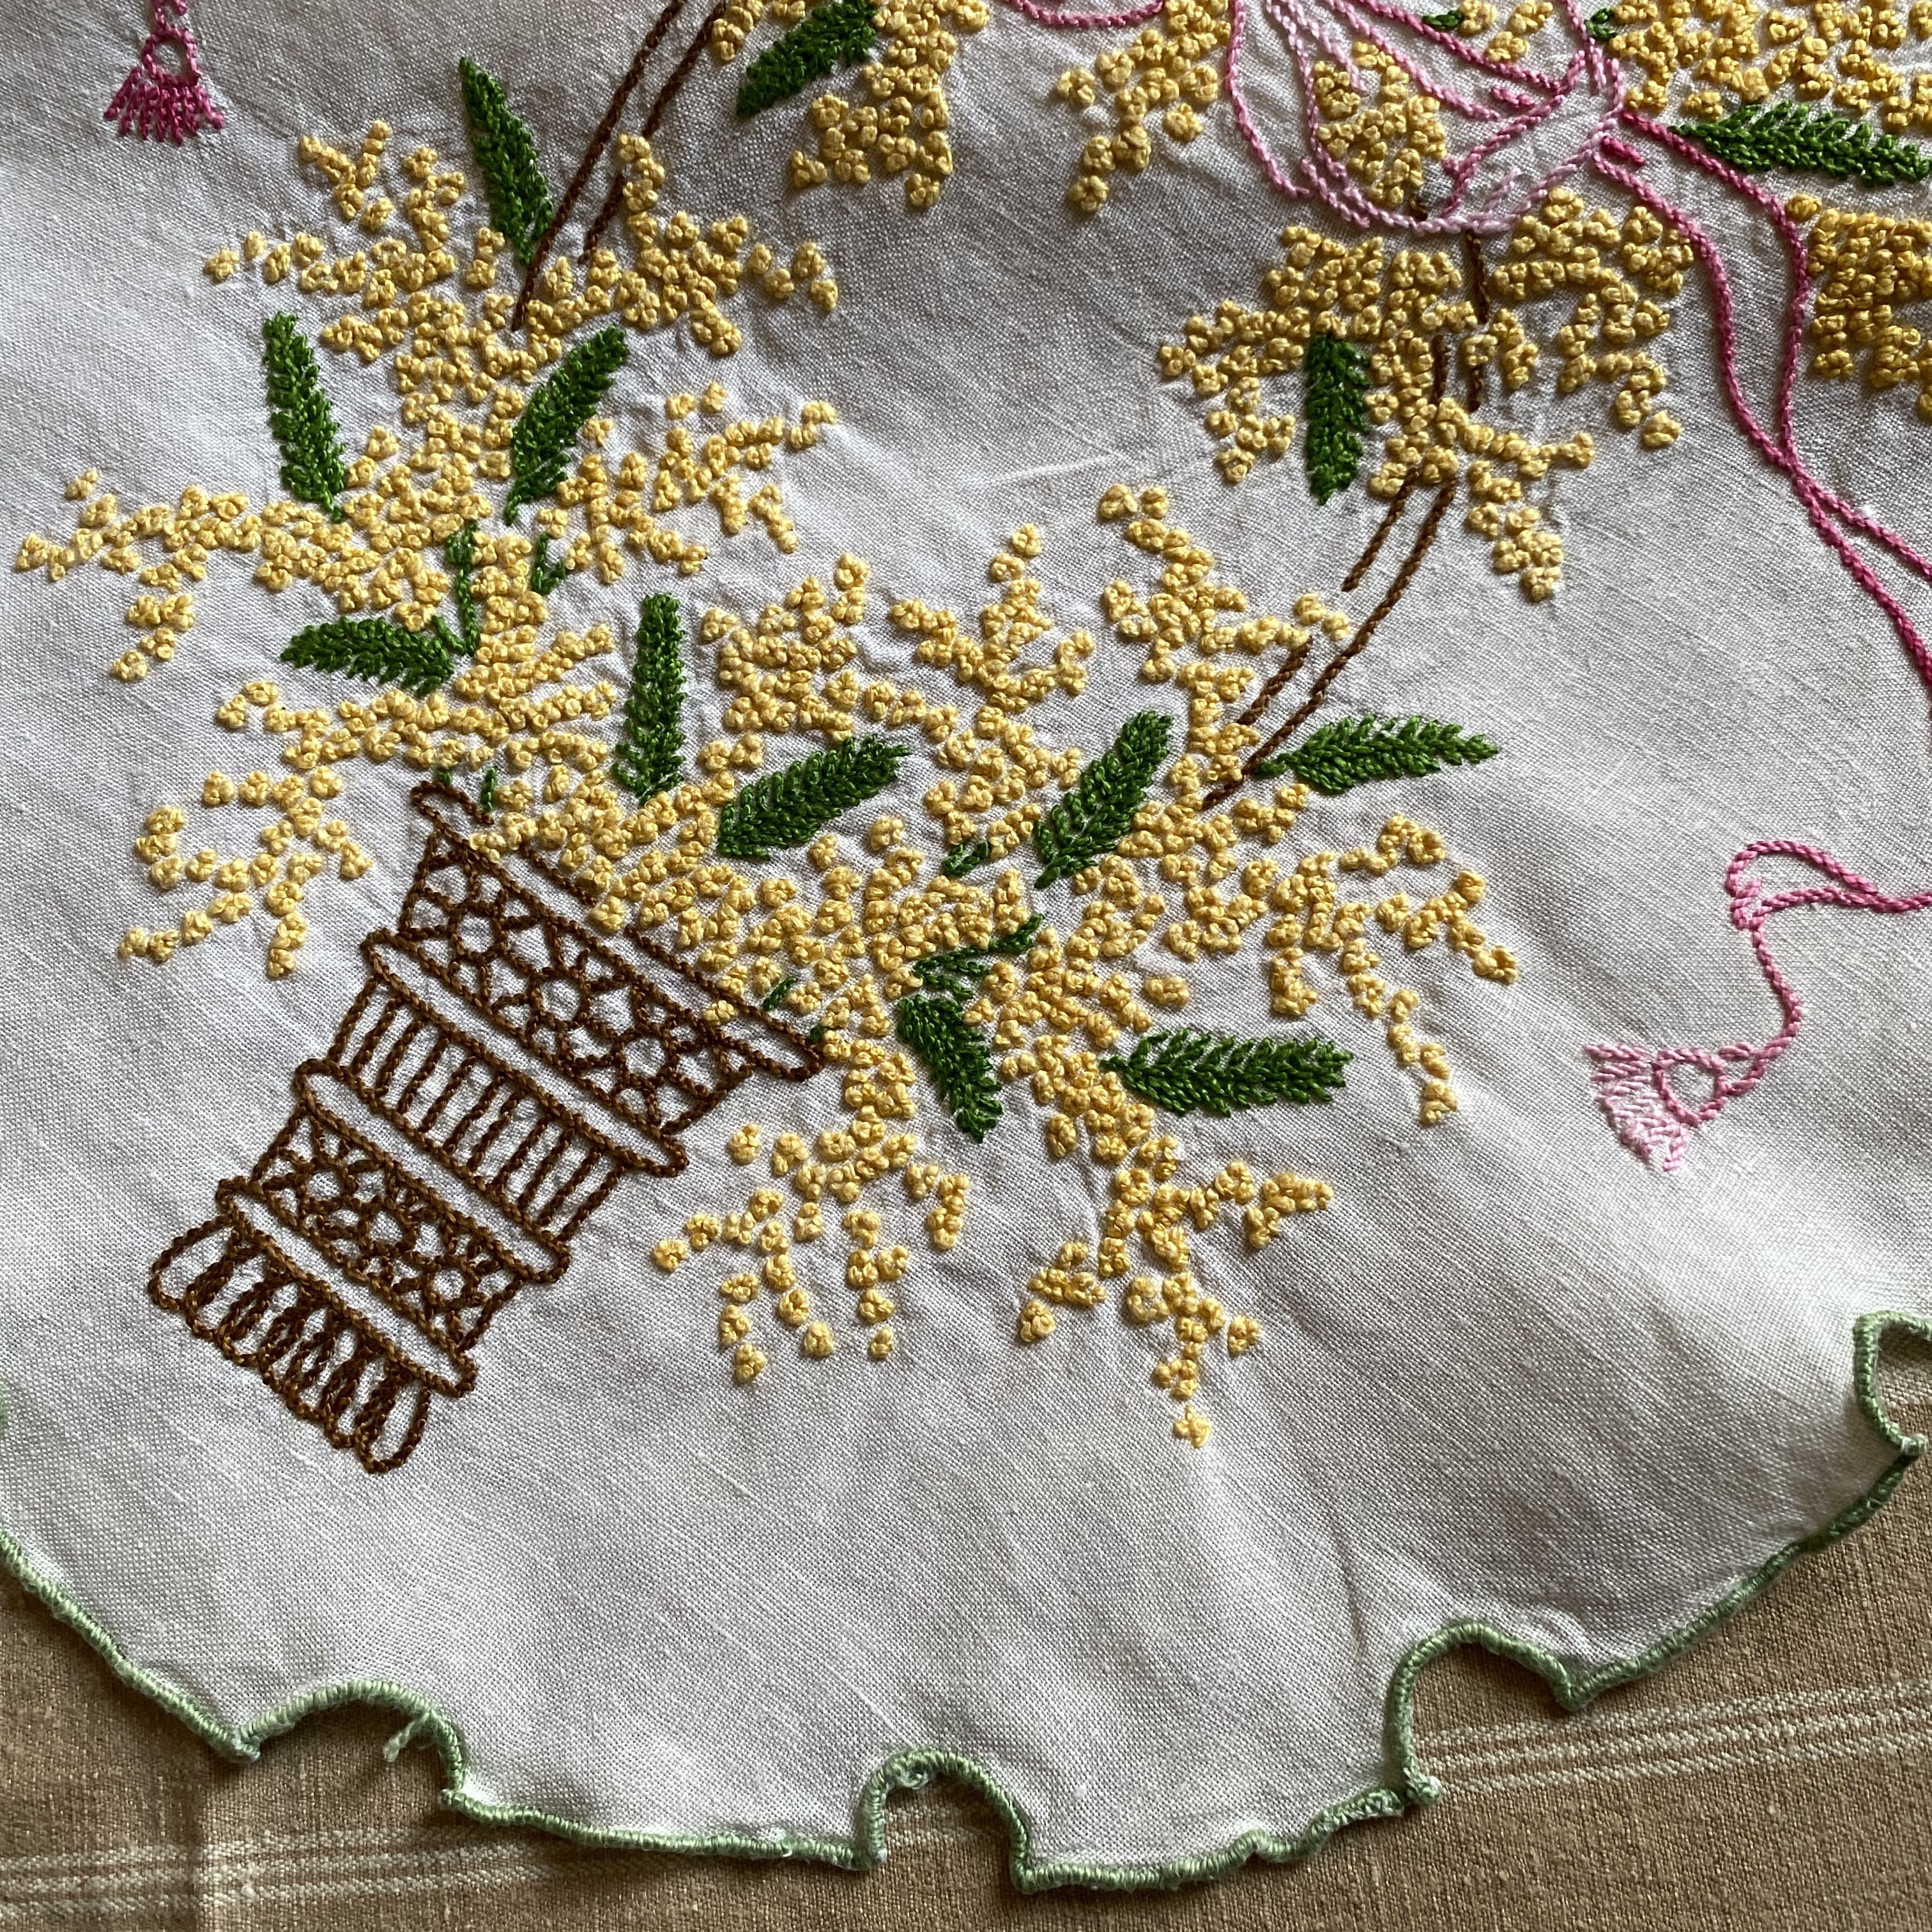 France ヴィンテージ手刺繍ドイリー・ミモザ / uv0111